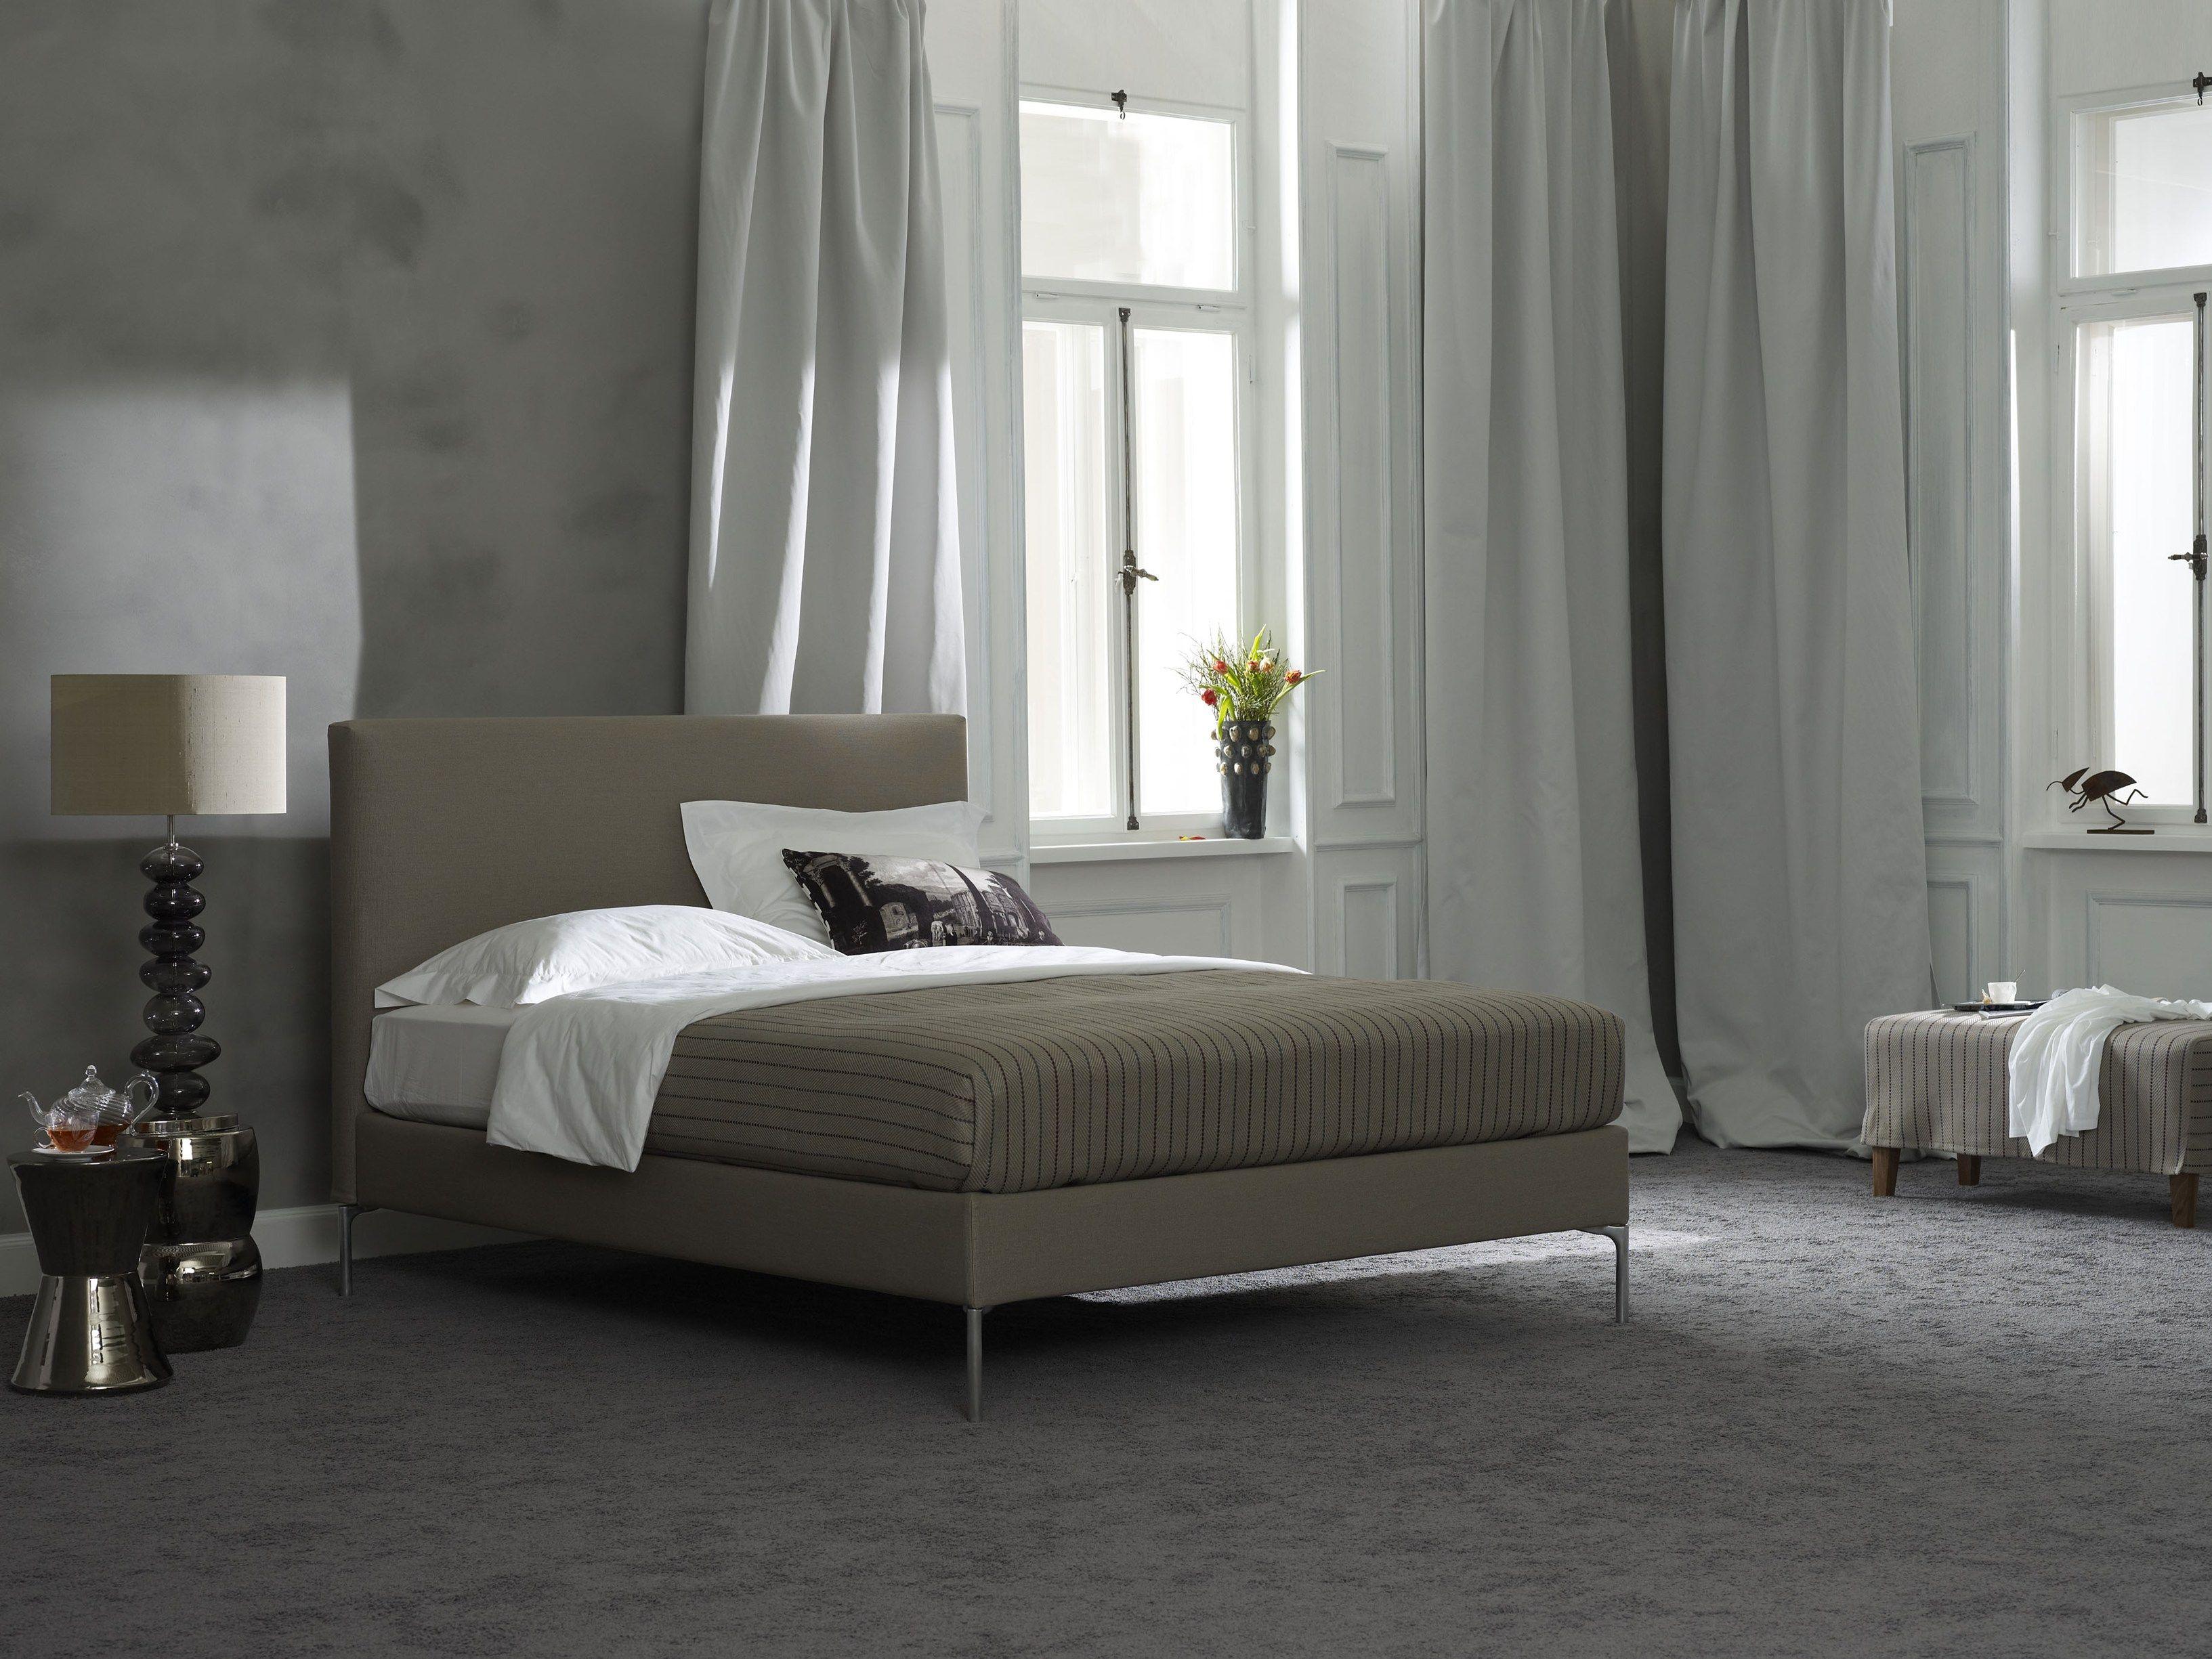 letto imbottito matrimoniale in tessuto basis 18 change by schramm werkst tten. Black Bedroom Furniture Sets. Home Design Ideas